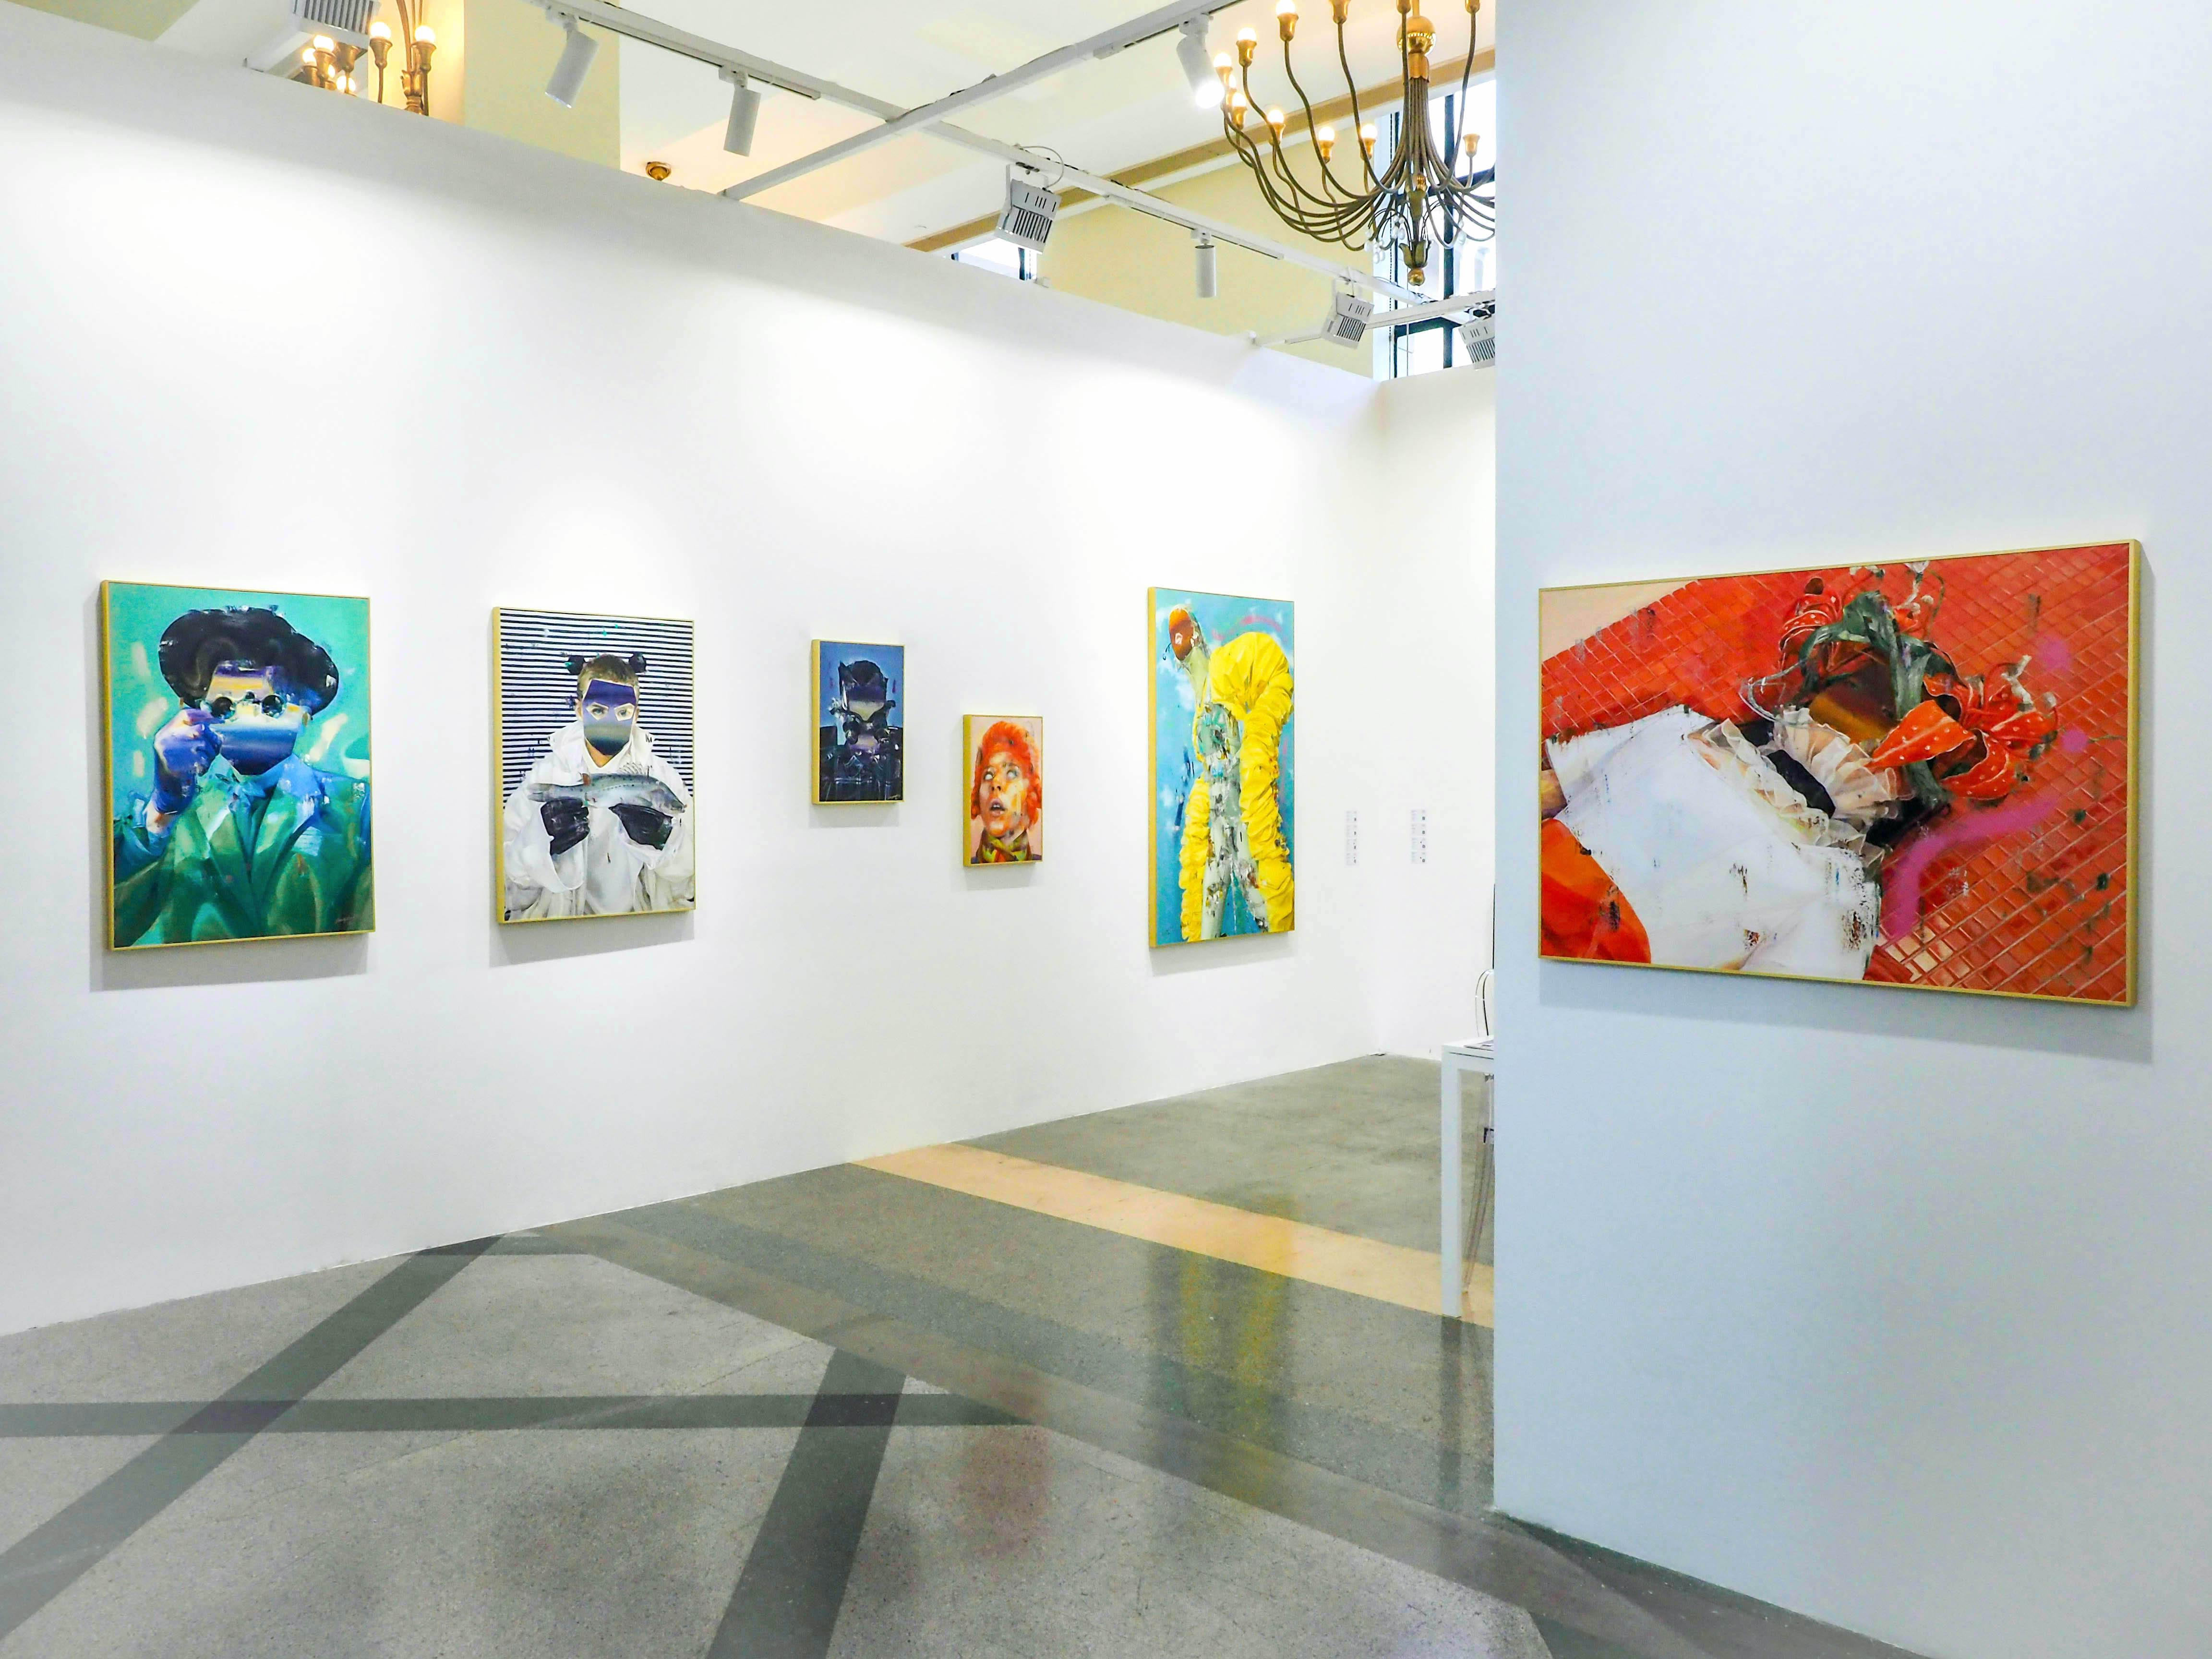 ART 021量子画廊展位现场